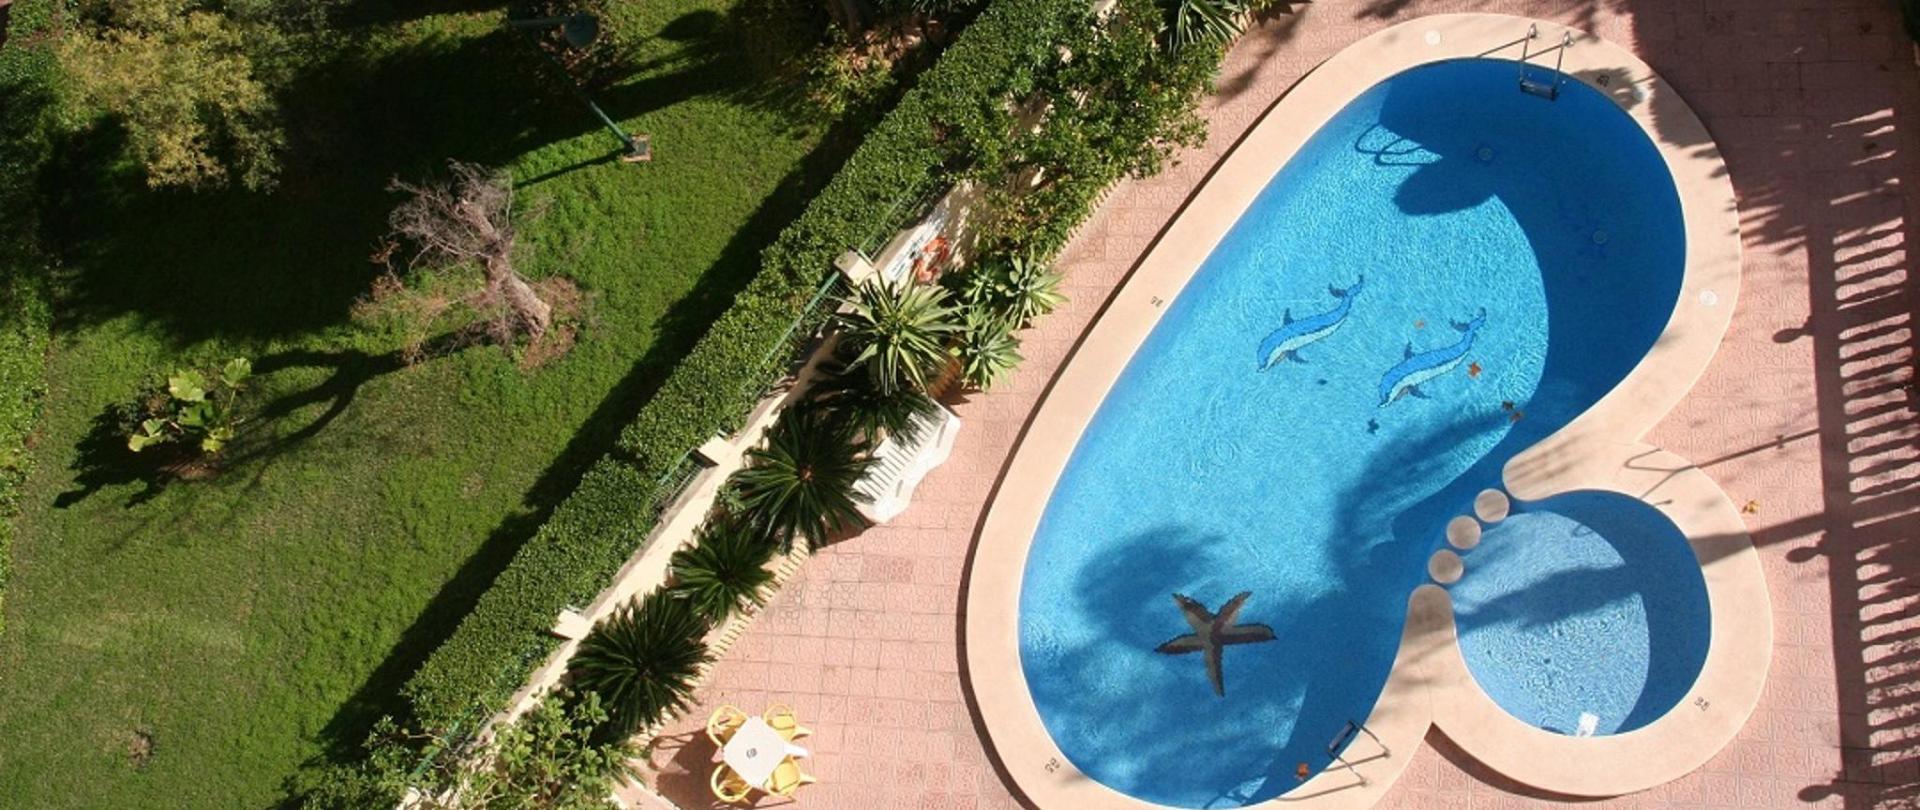 Maria Victoria piscina 1.jpg